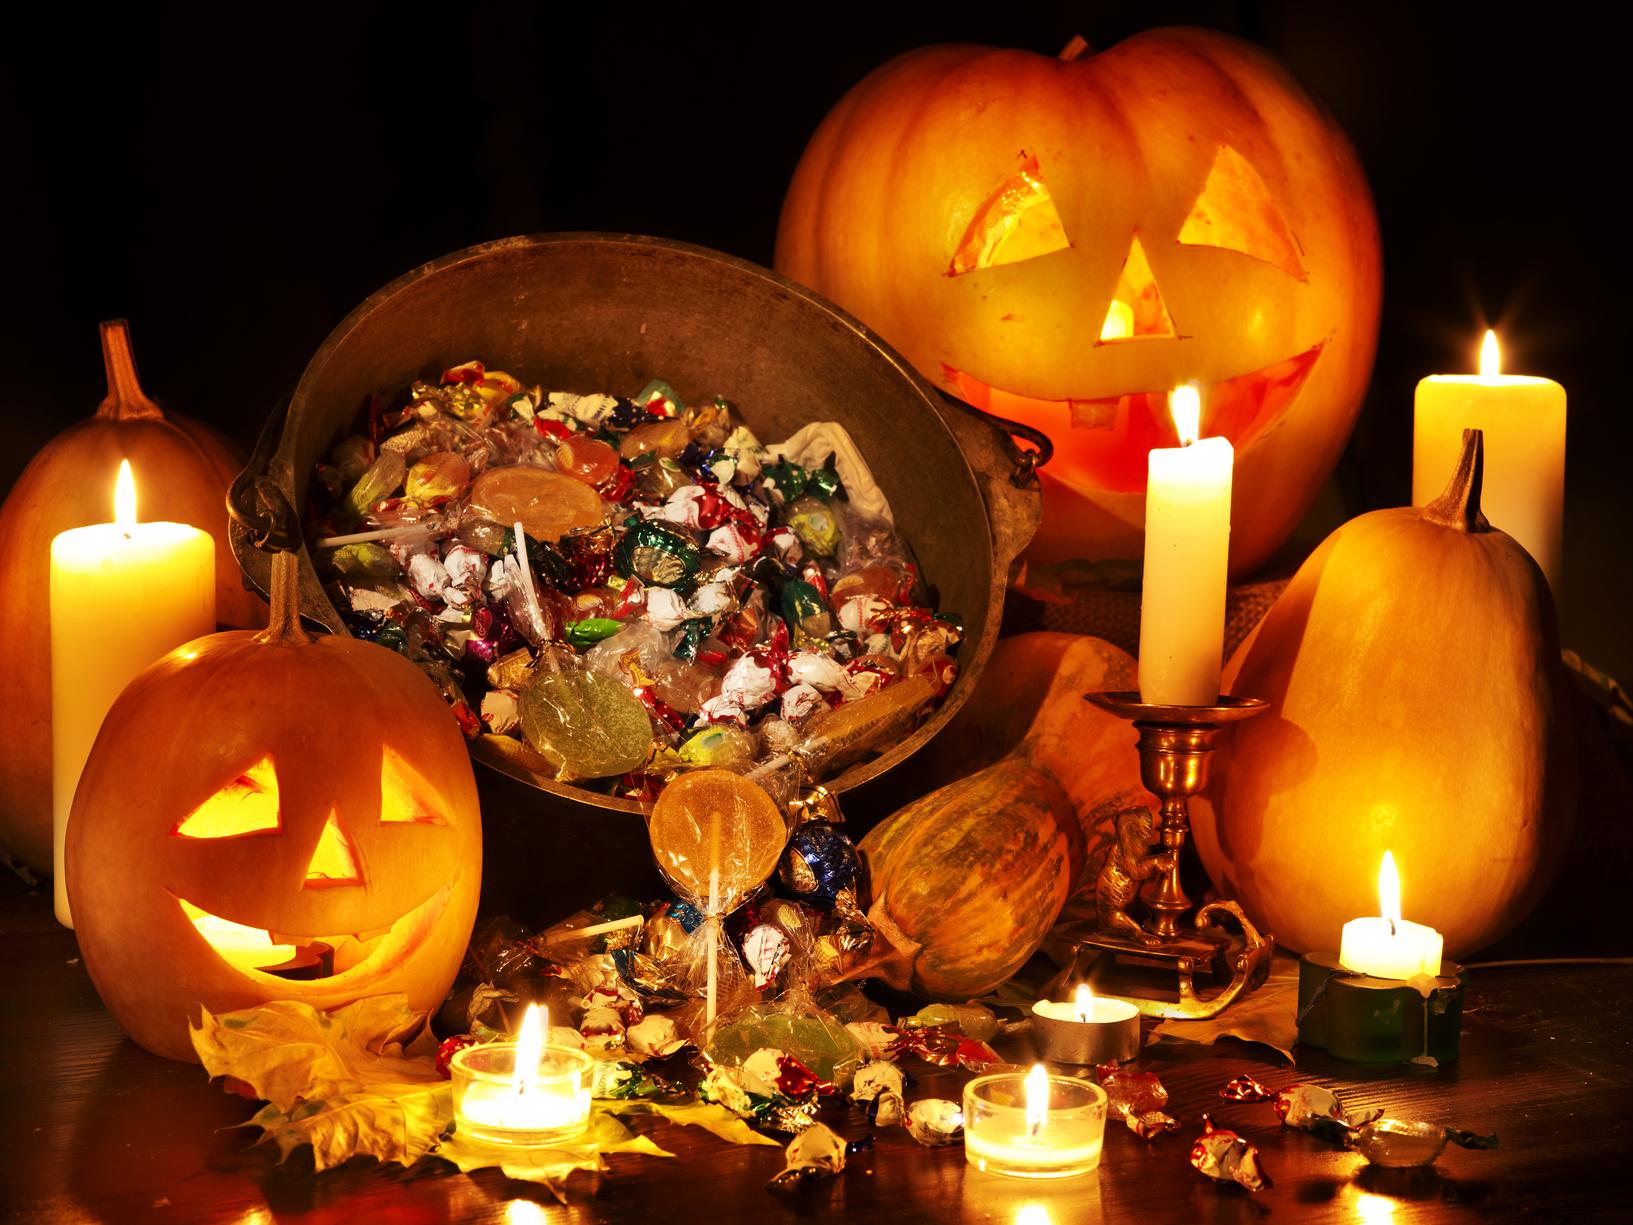 Halloween pumpkin lantern. Trick or treat.